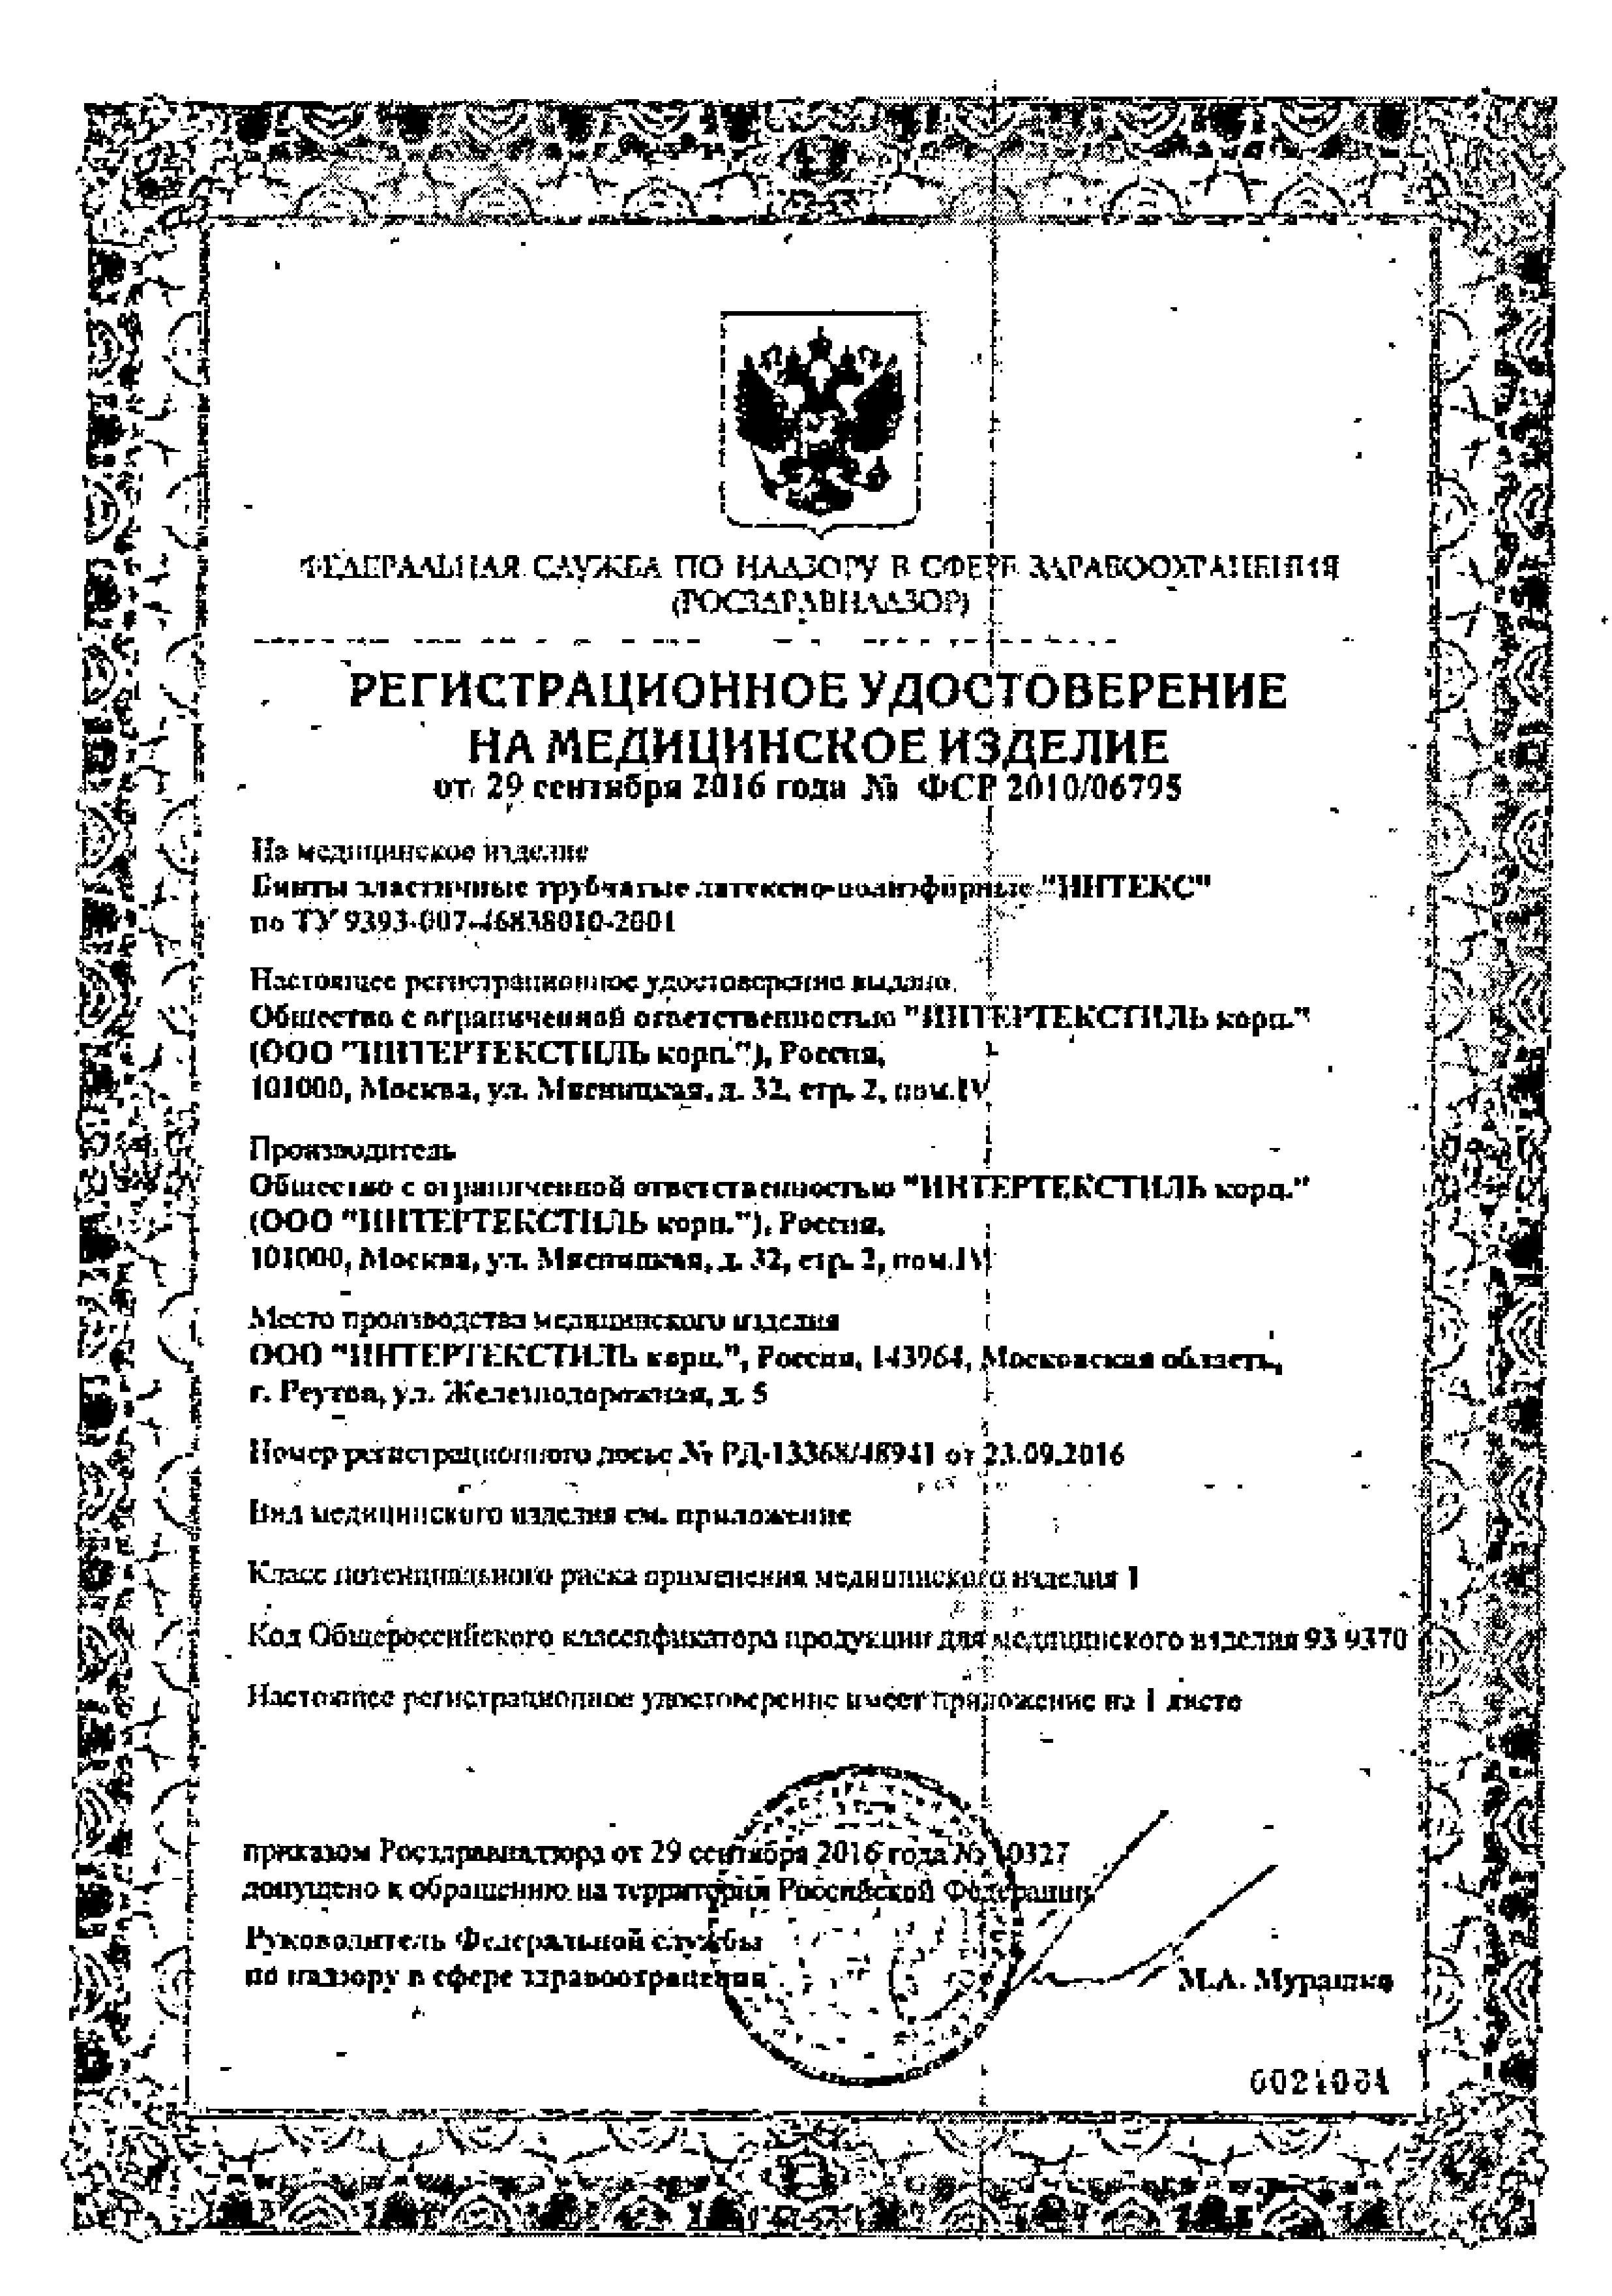 Интекс Бинт трубчатый сертификат